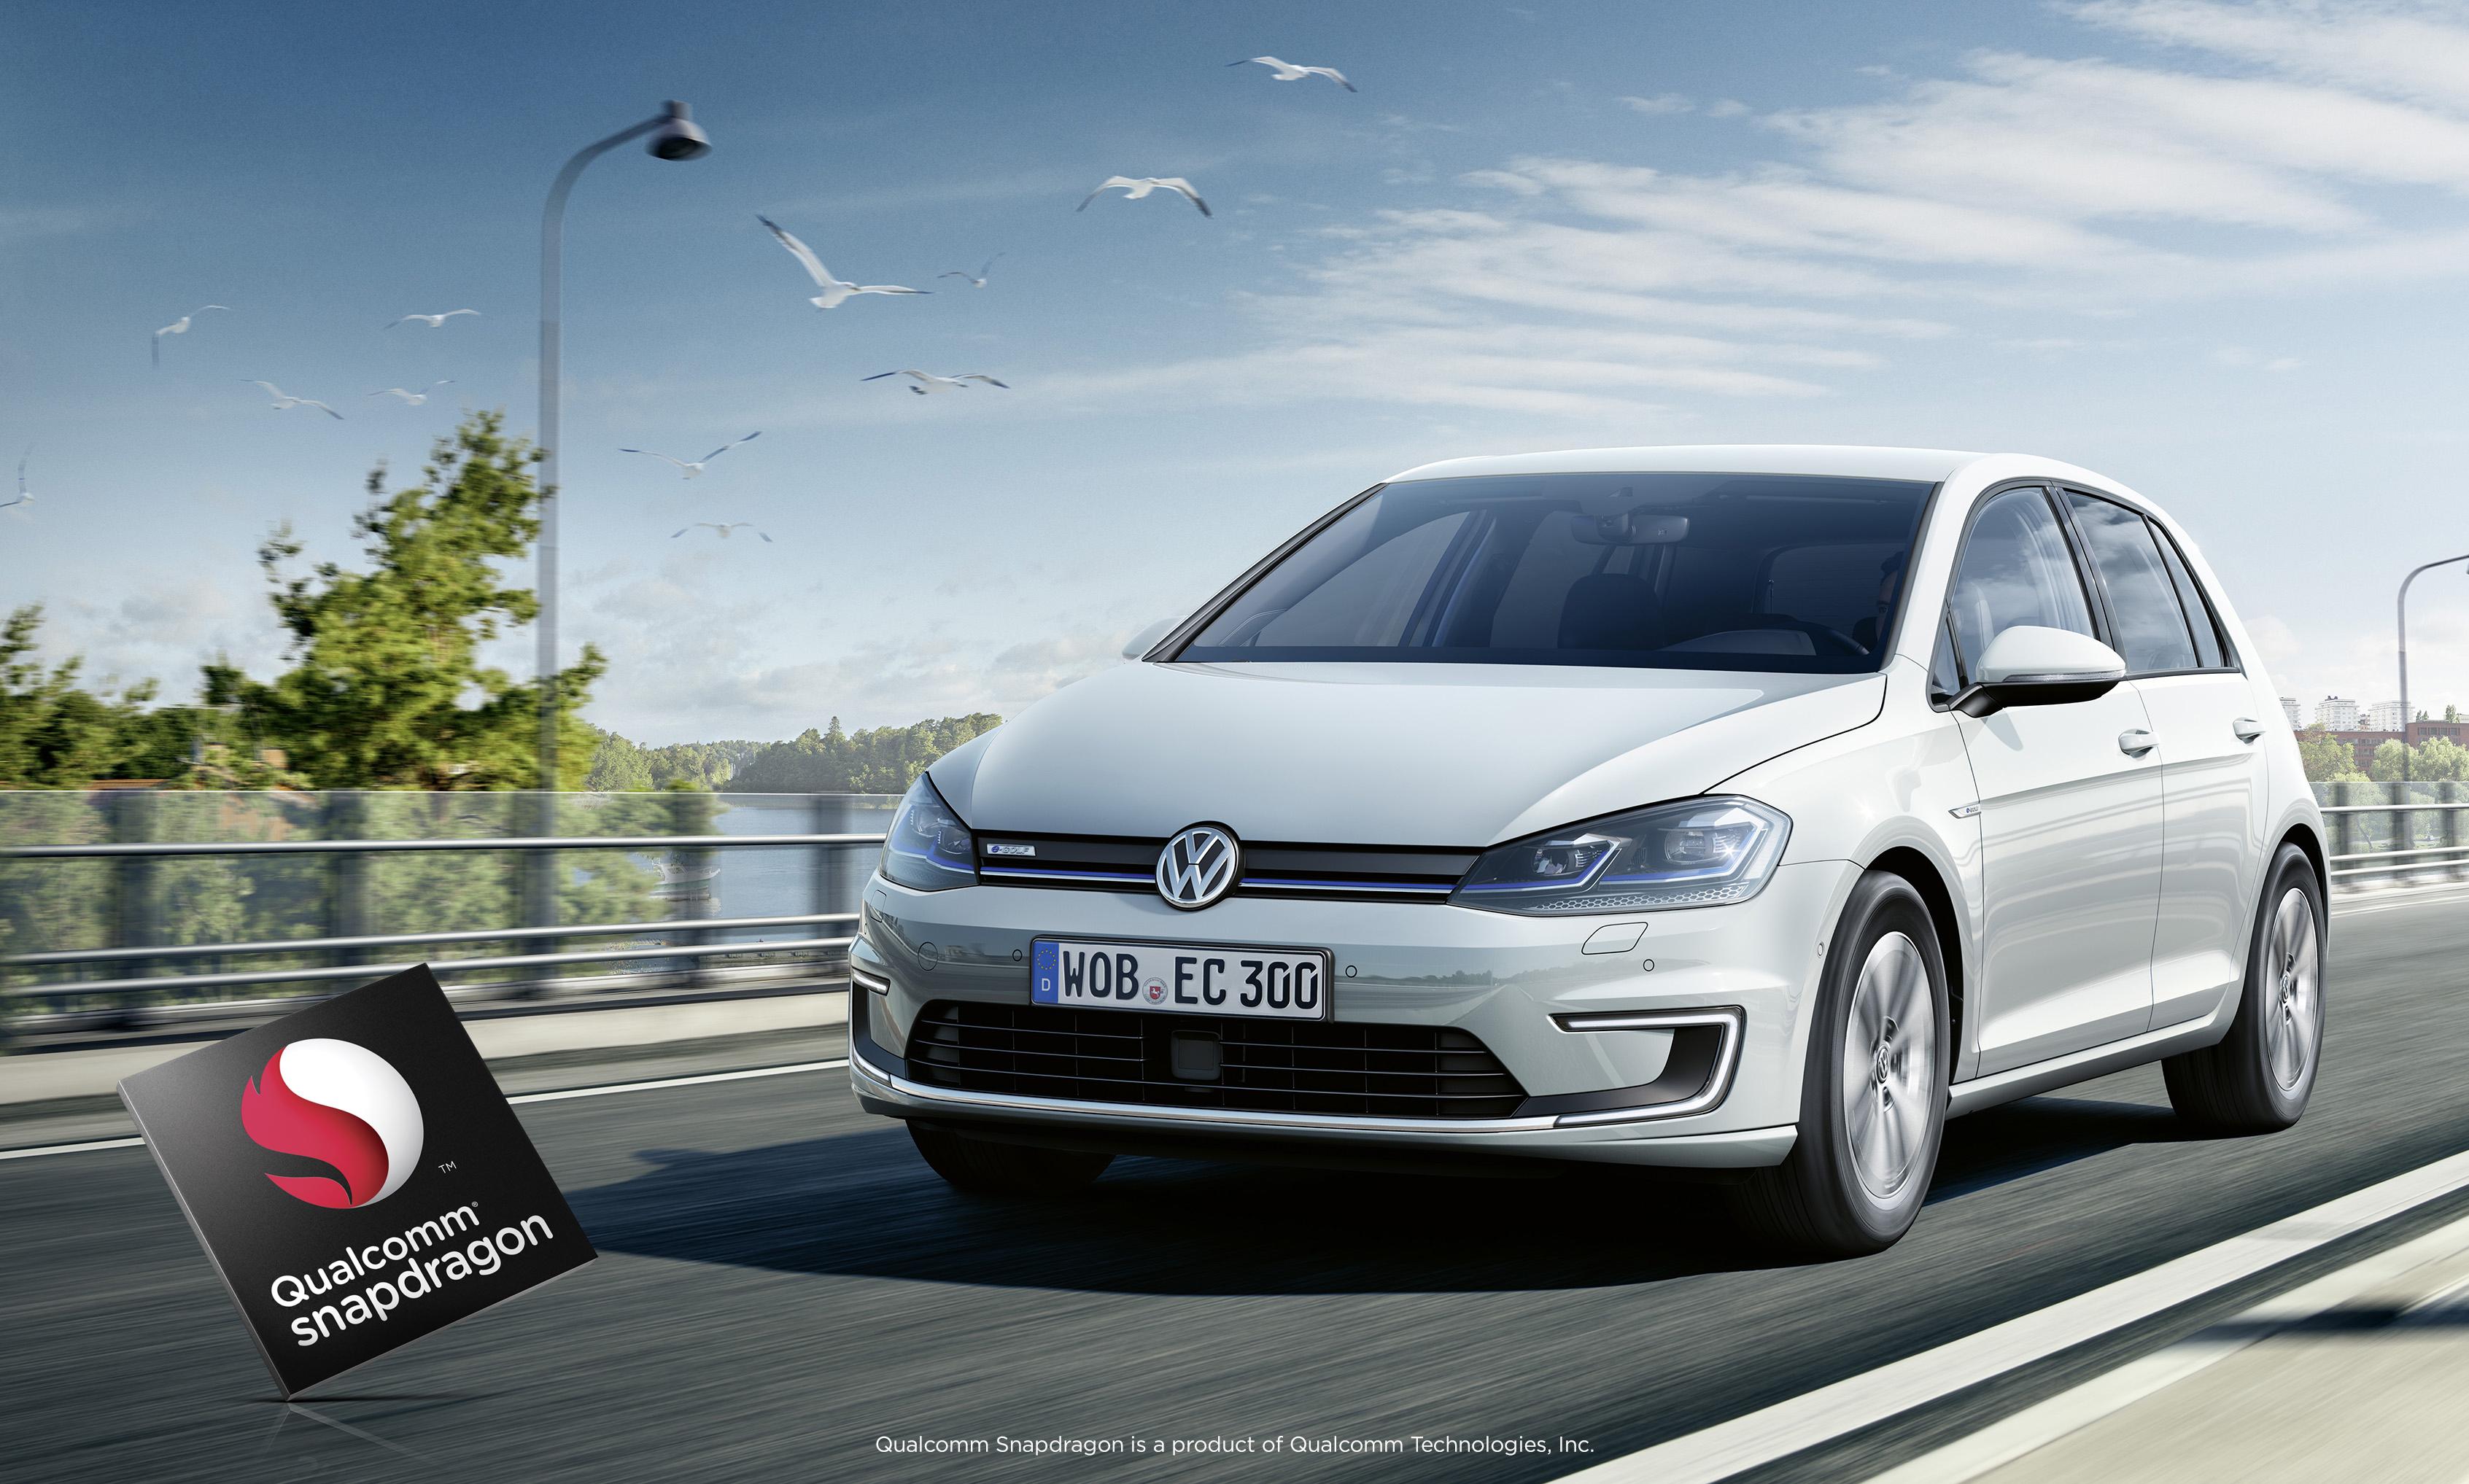 Volkswagen car and Snapdragon chip.